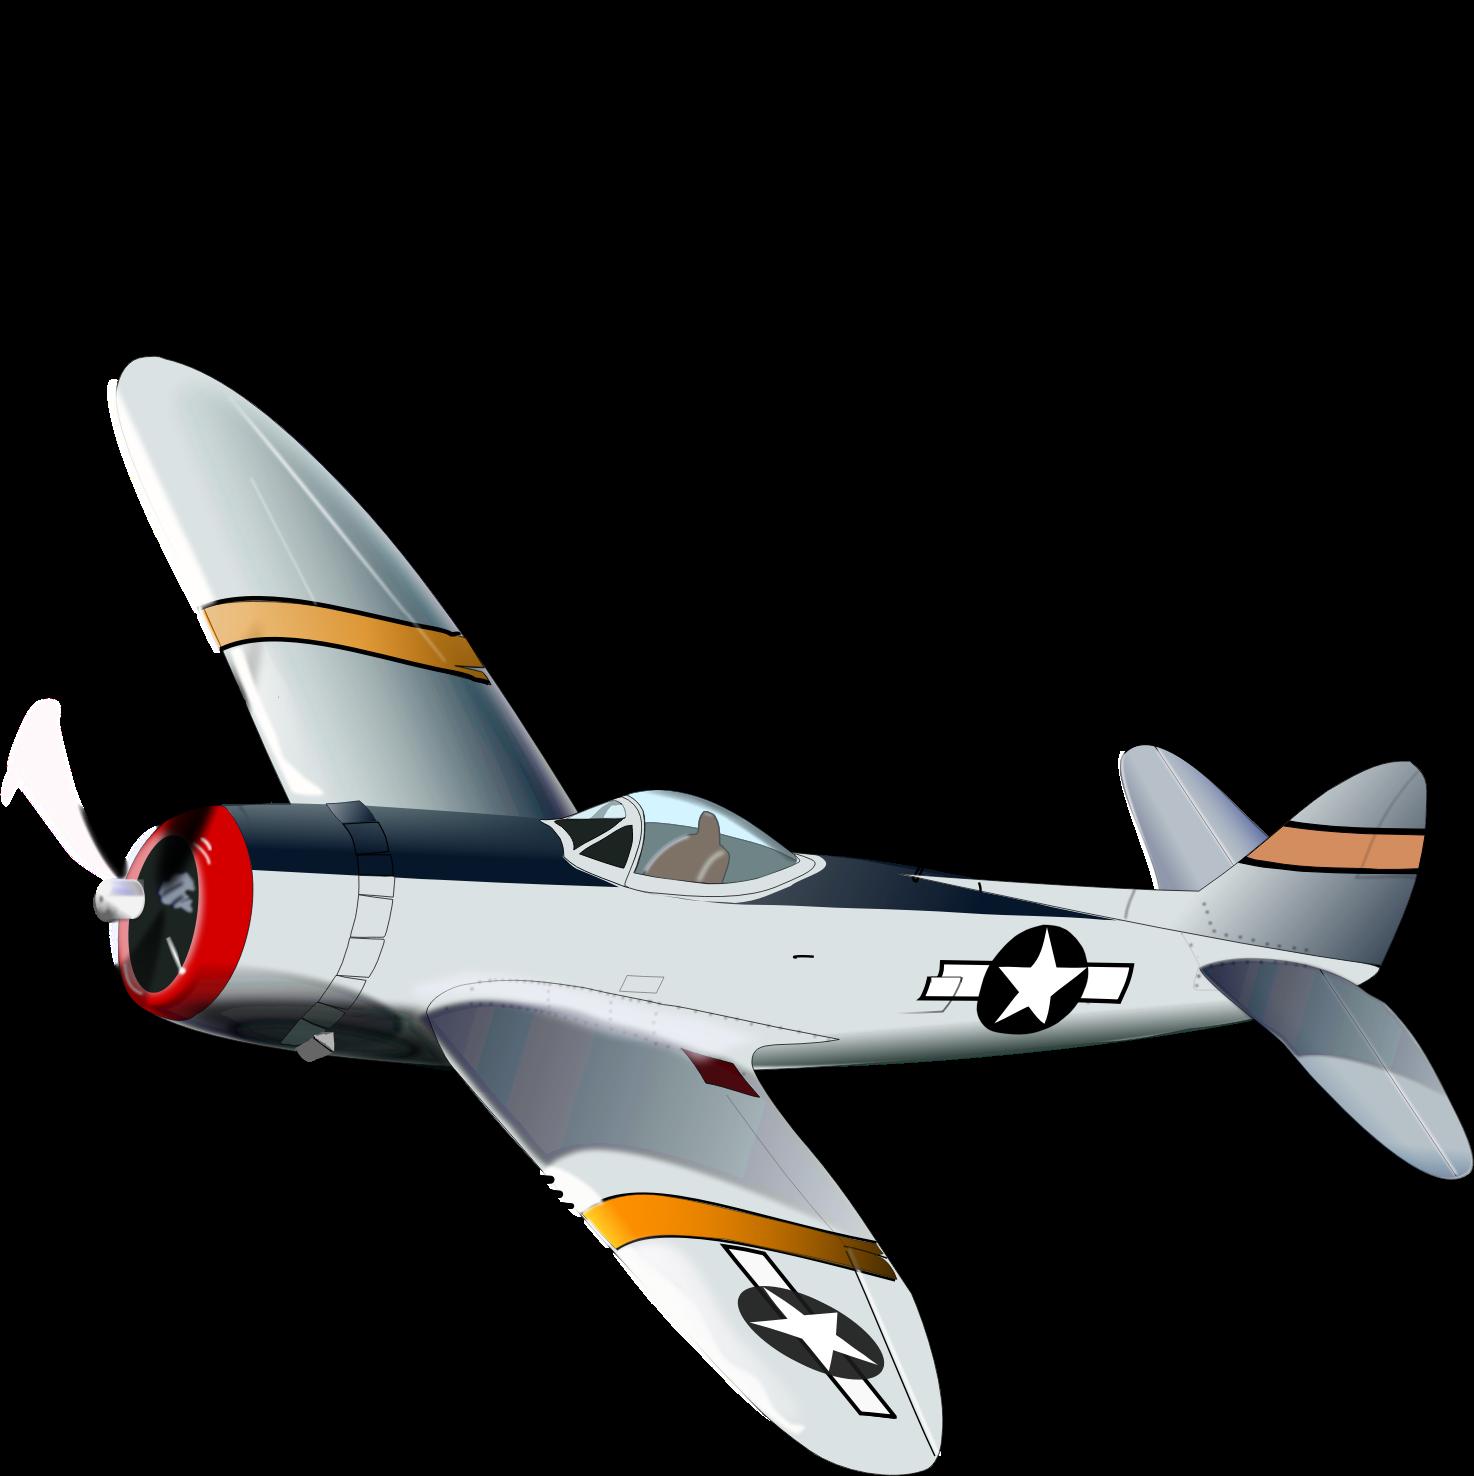 Clipart - P47 Thunderbolt Thunderbolt Clipart